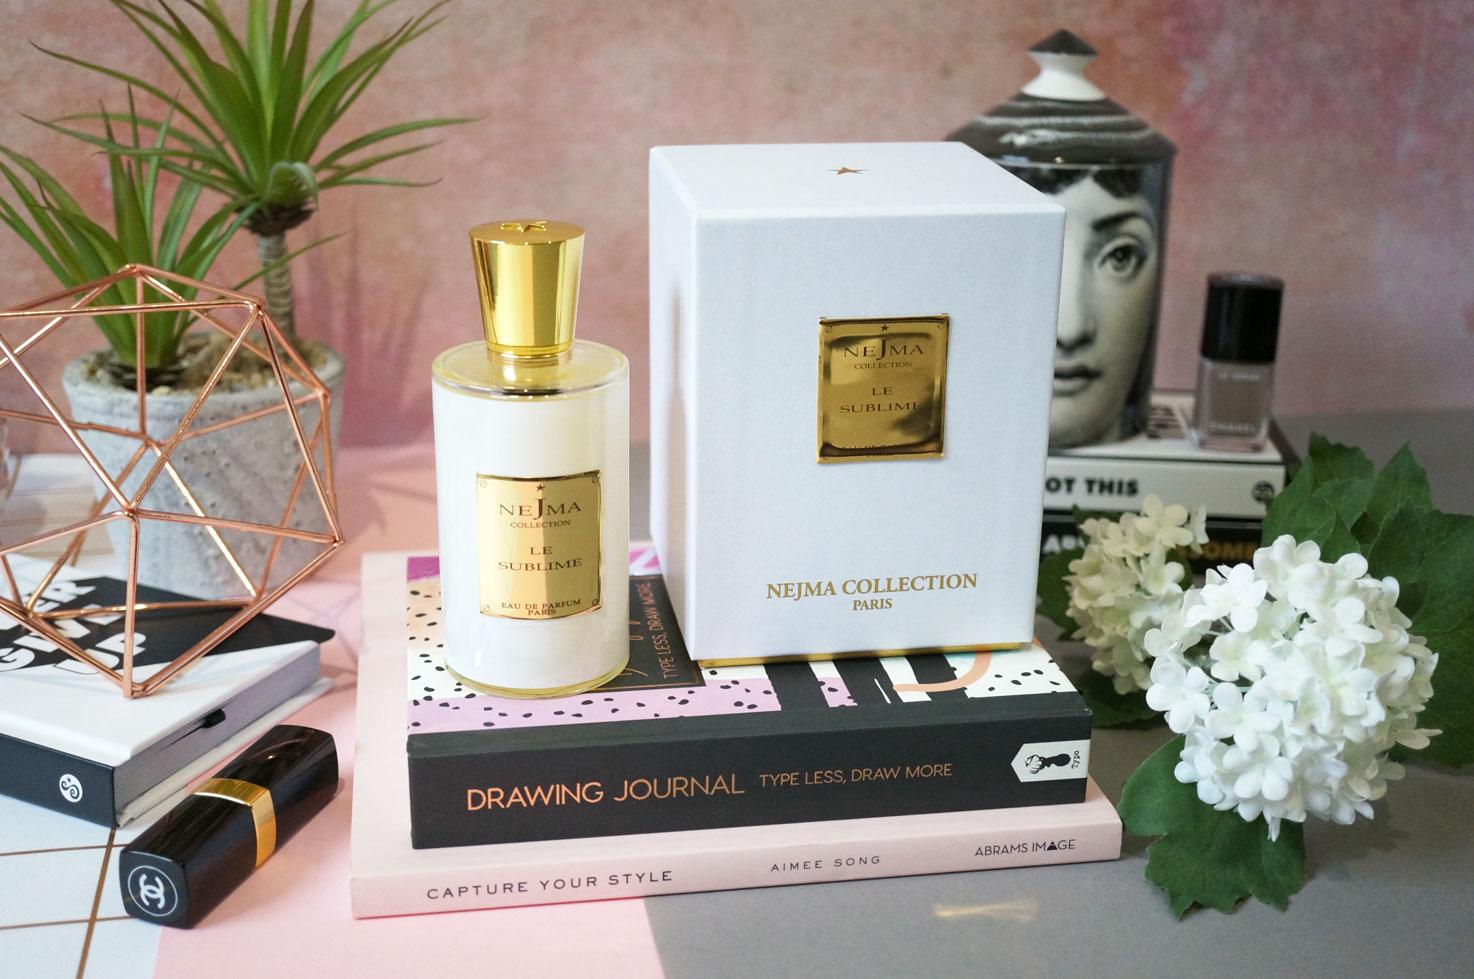 Fragrance: Nejma Le Sublime EDP